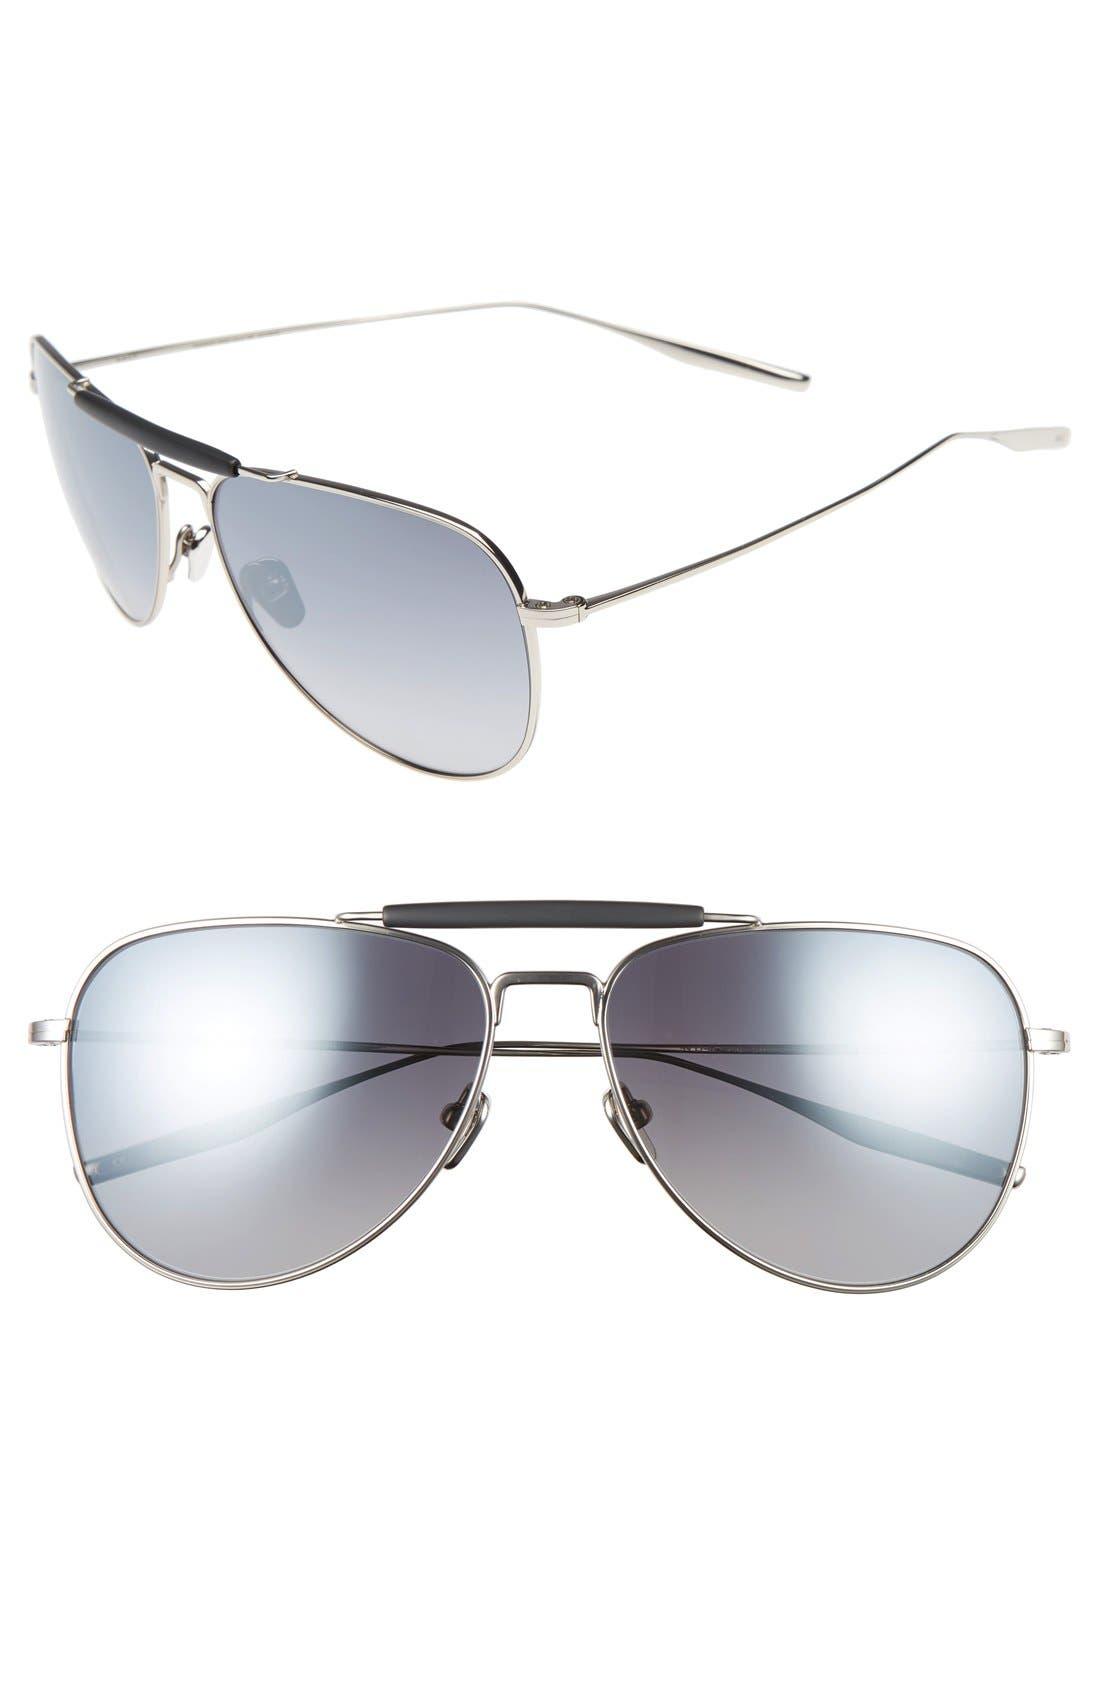 Striker 59mm Aviator Sunglasses,                             Alternate thumbnail 4, color,                             TRADITIONAL SILVER